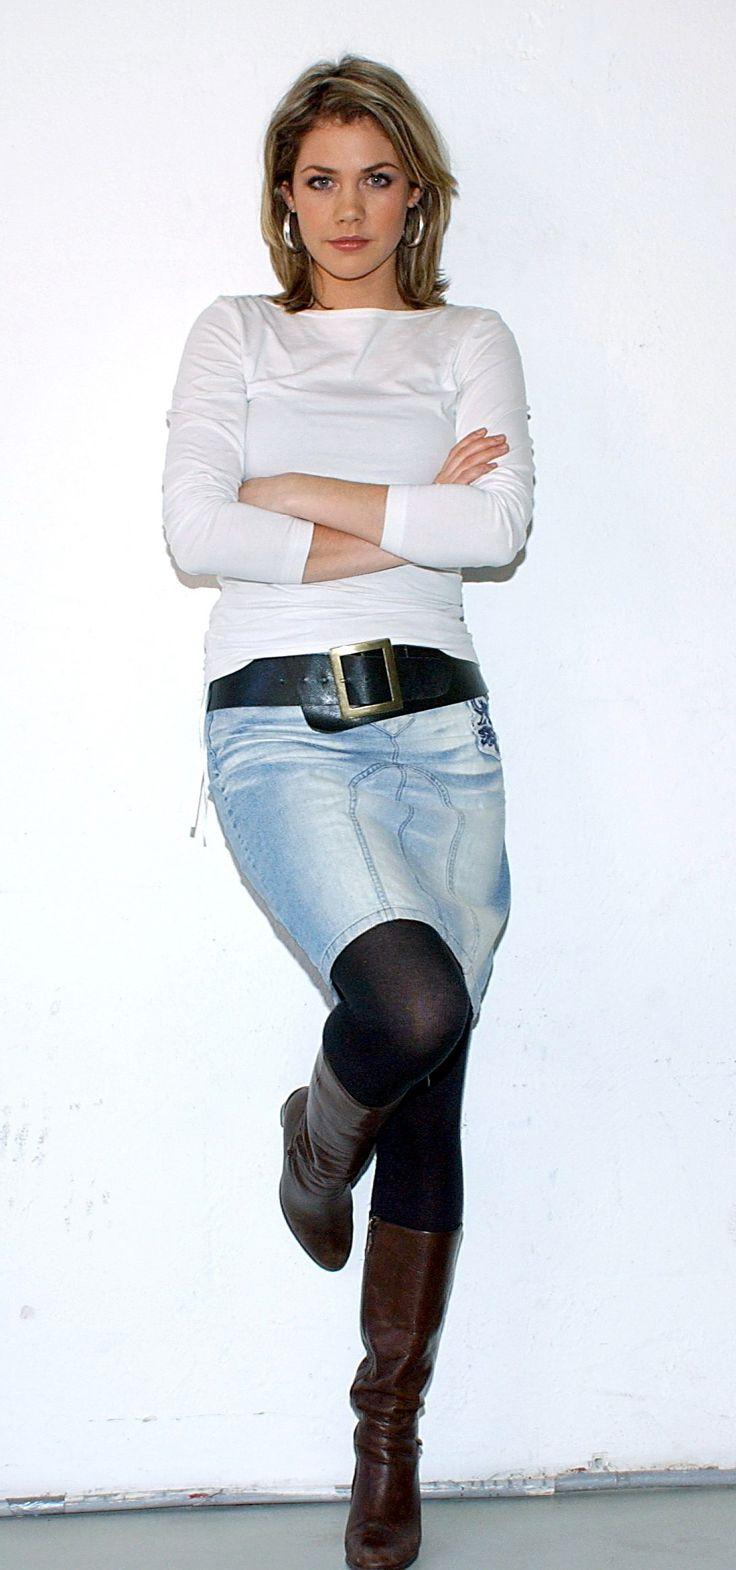 Felicitas Woll (Actress)